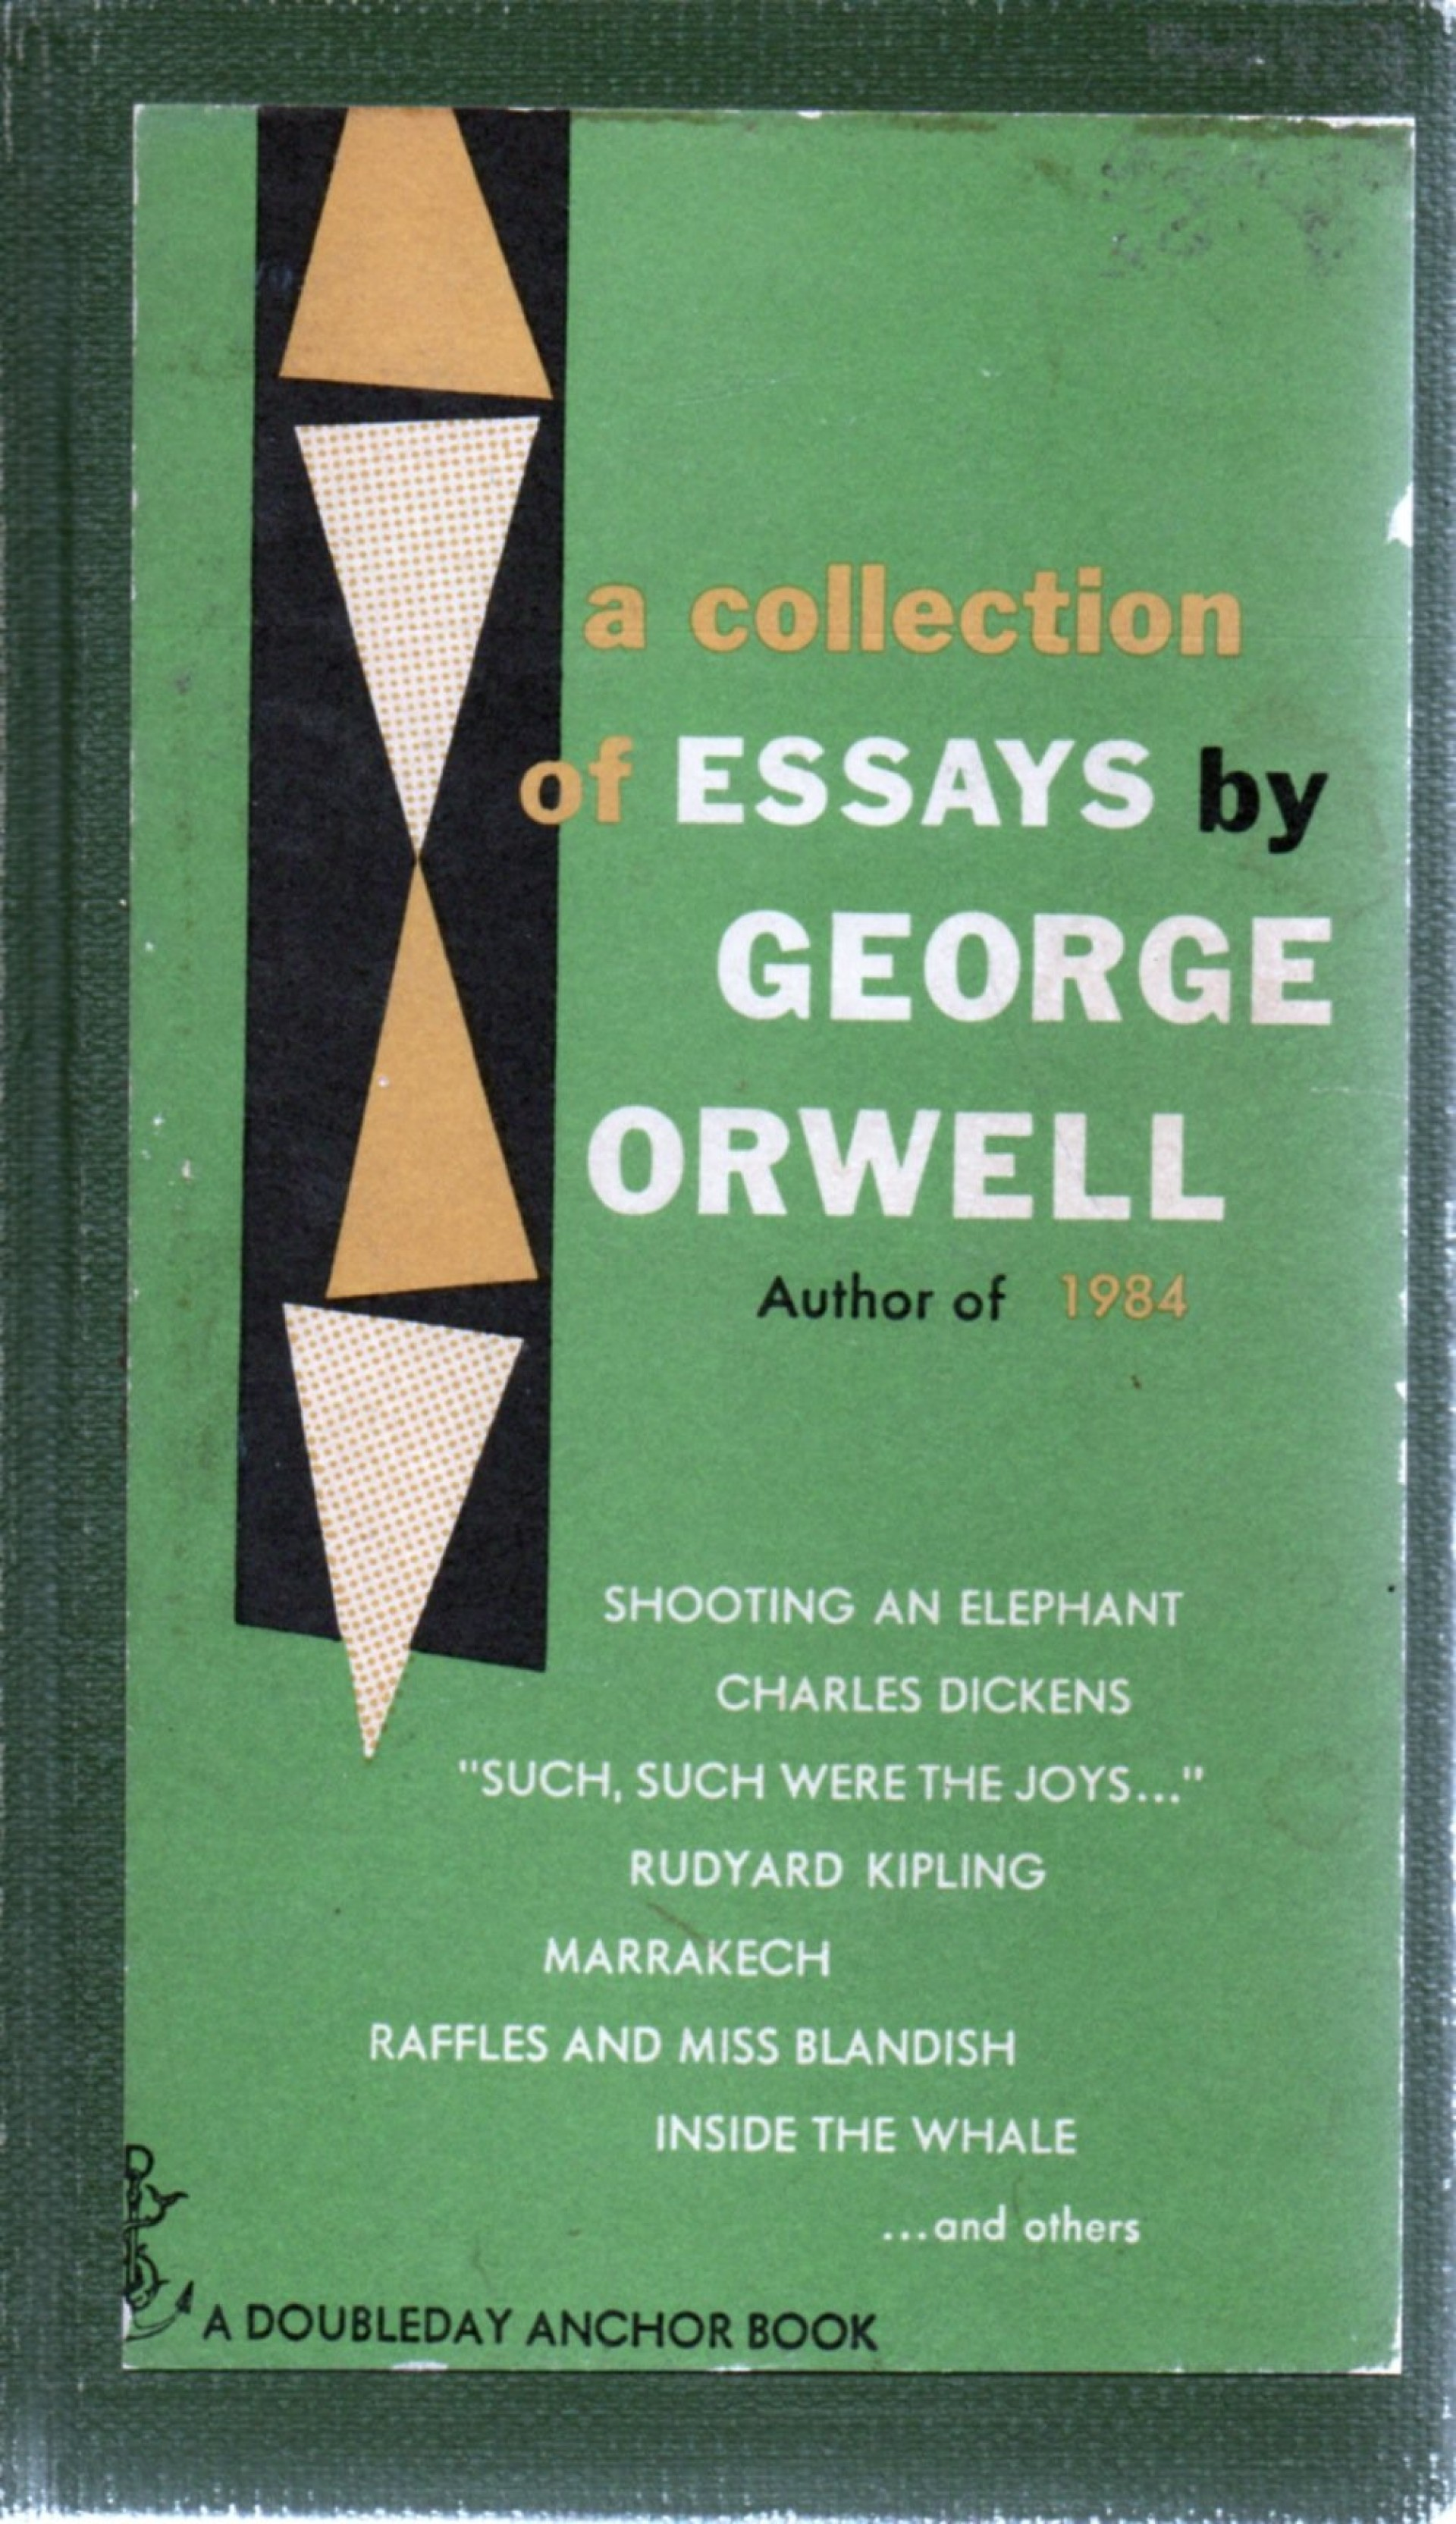 009 George Orwell Essays Essay Example Frightening Everyman's Library Summary Bookshop Memories 1920